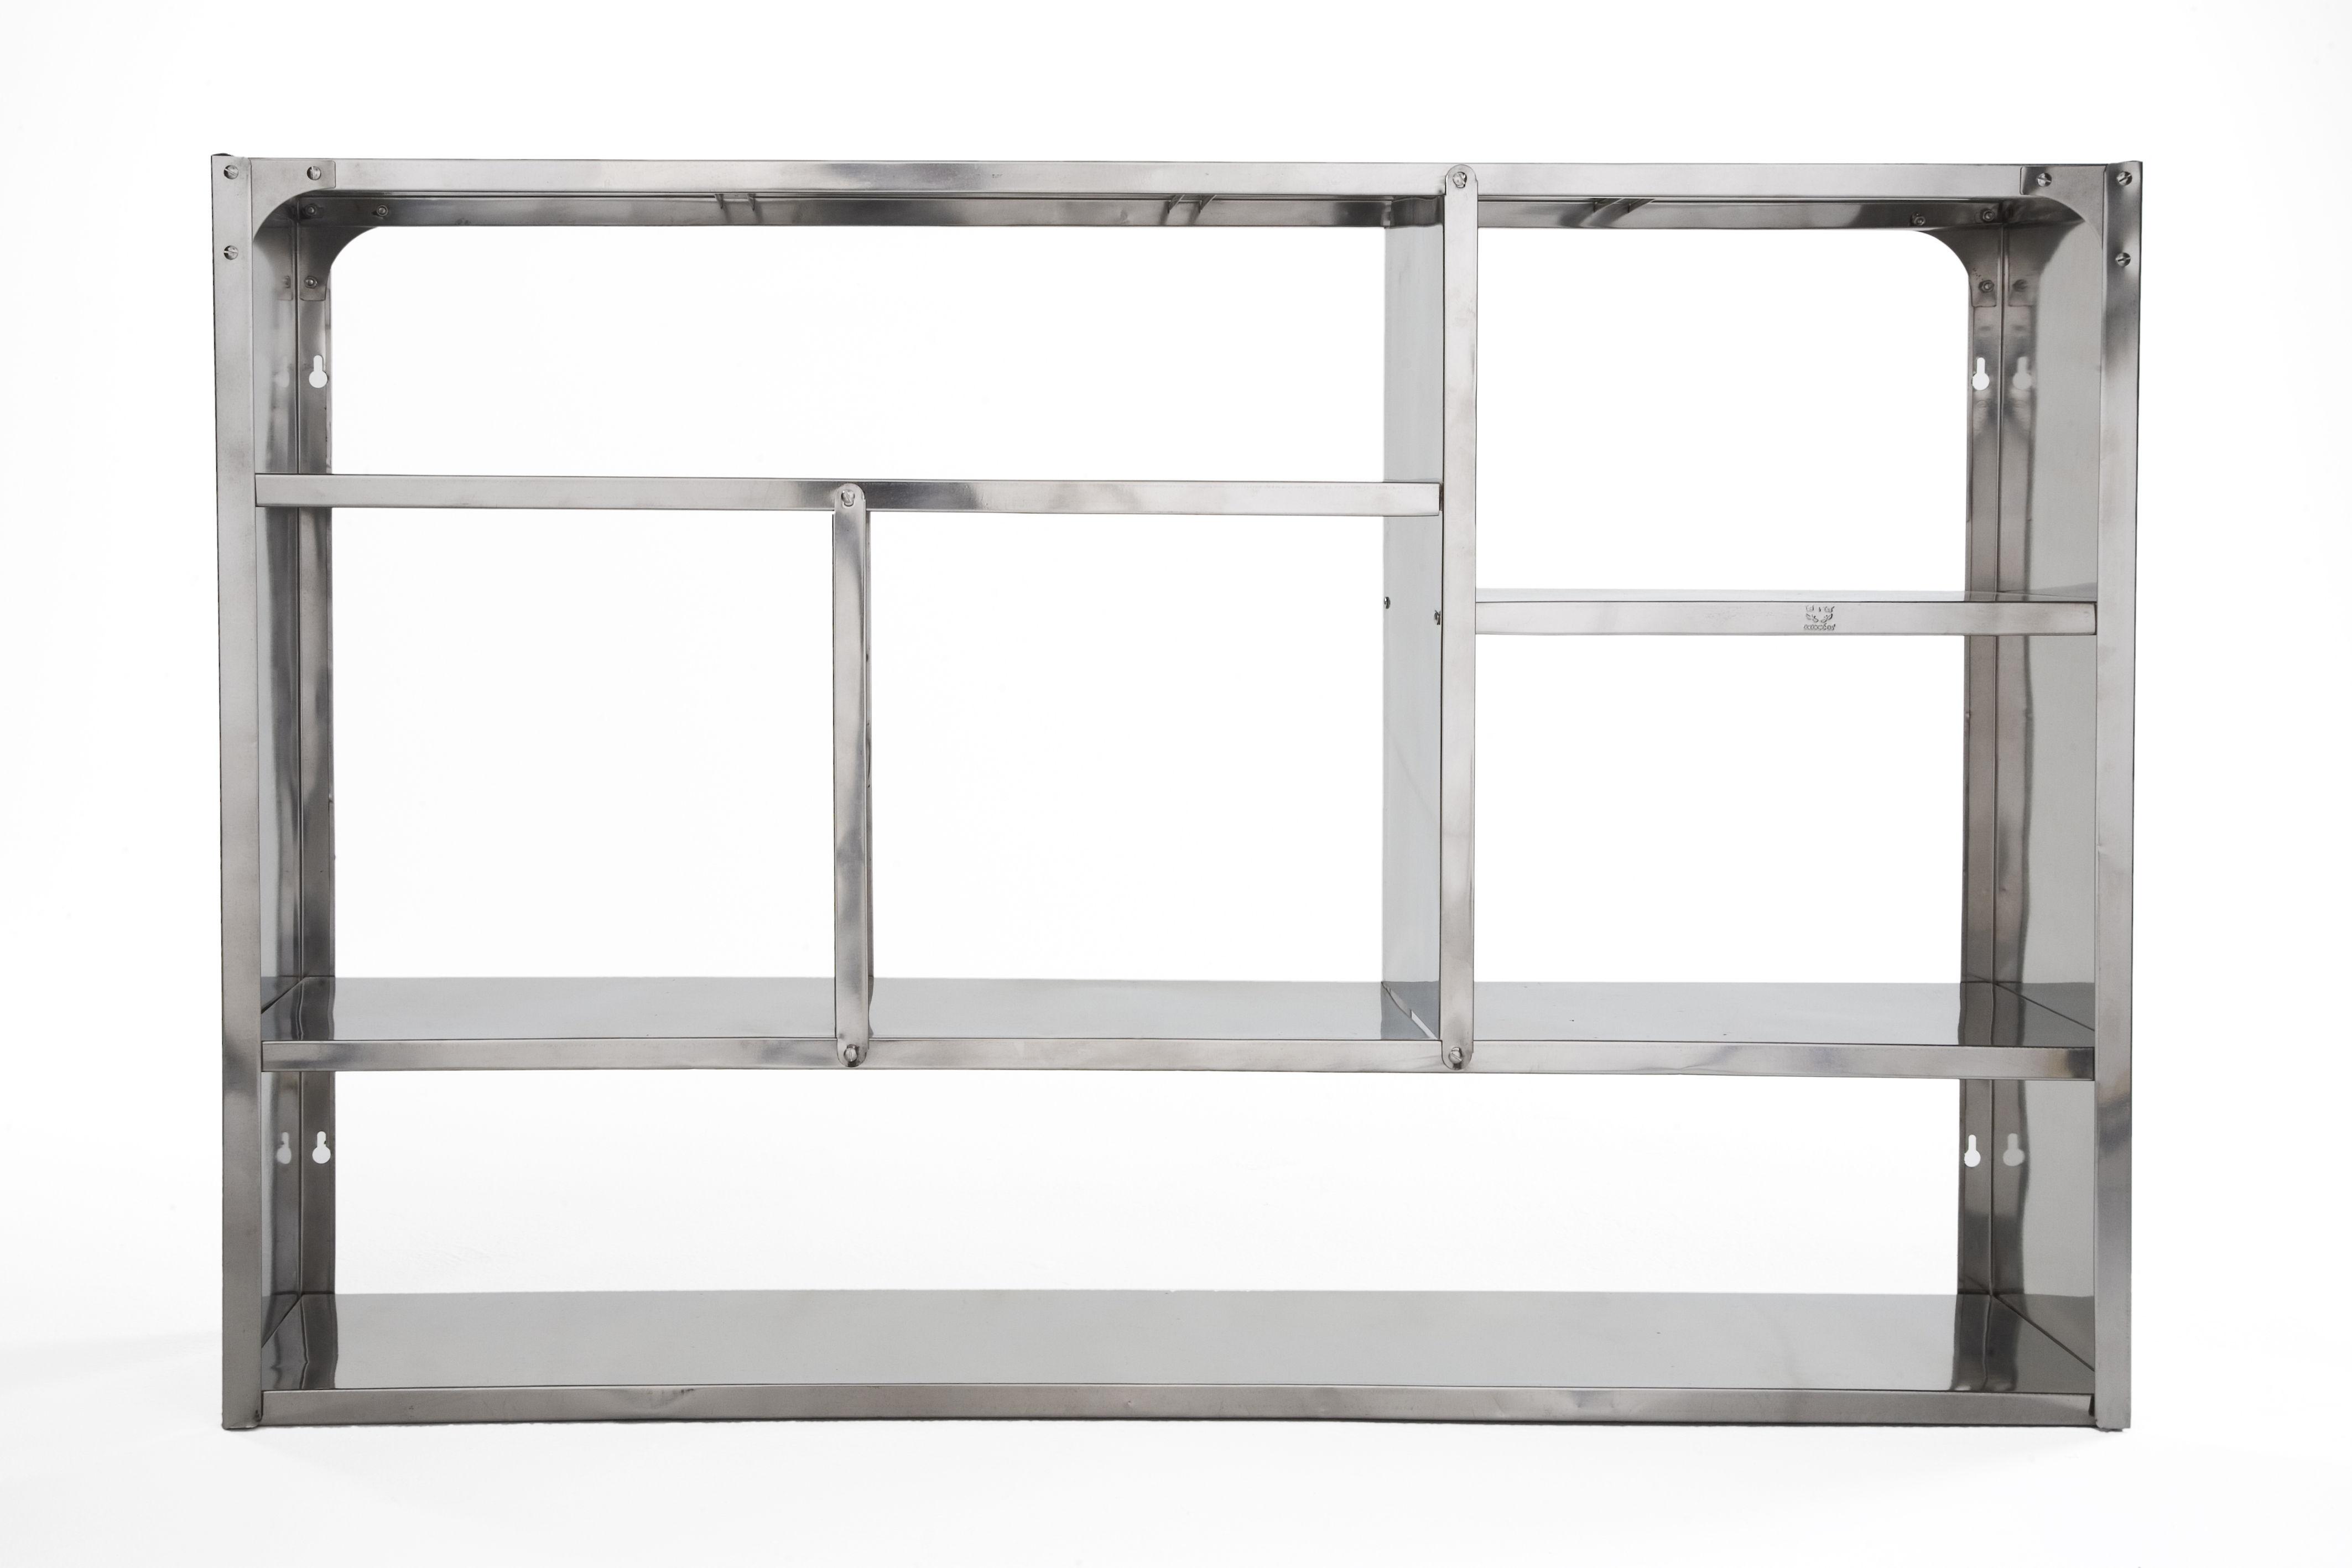 etag re m tal l 110 x h 79 cm inox ts ts. Black Bedroom Furniture Sets. Home Design Ideas